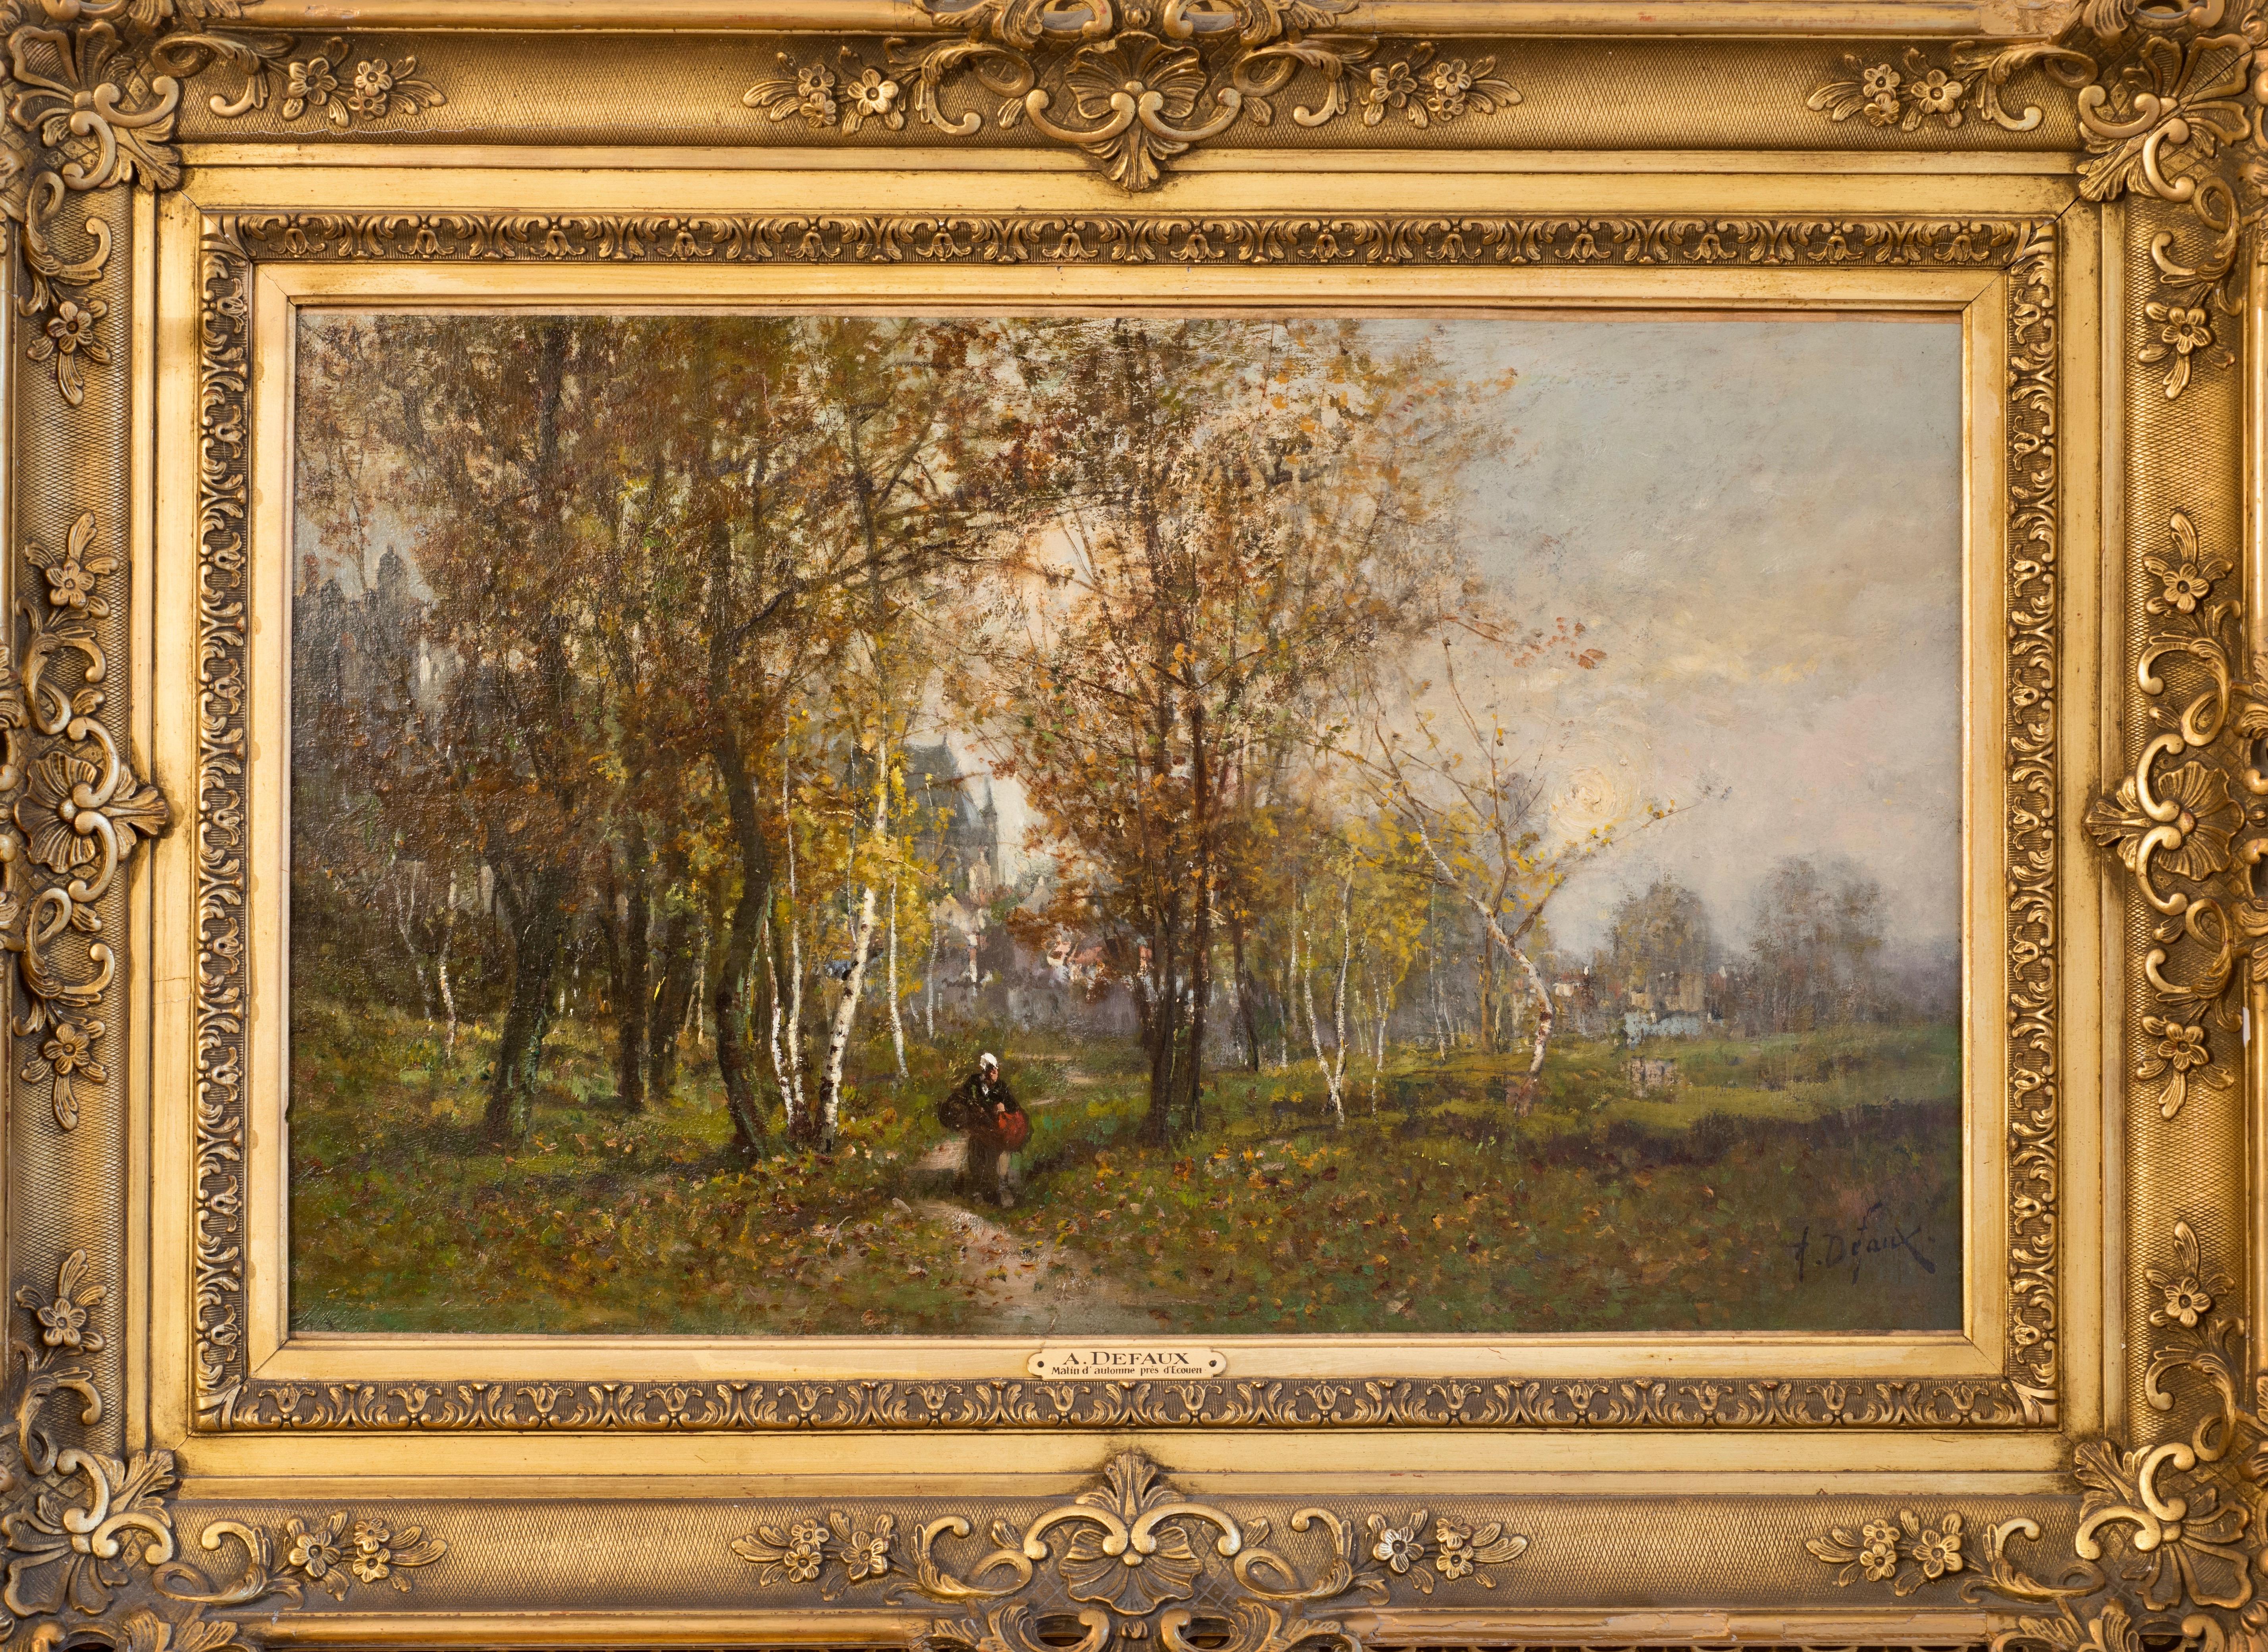 Defaux_The forest of Ecouen